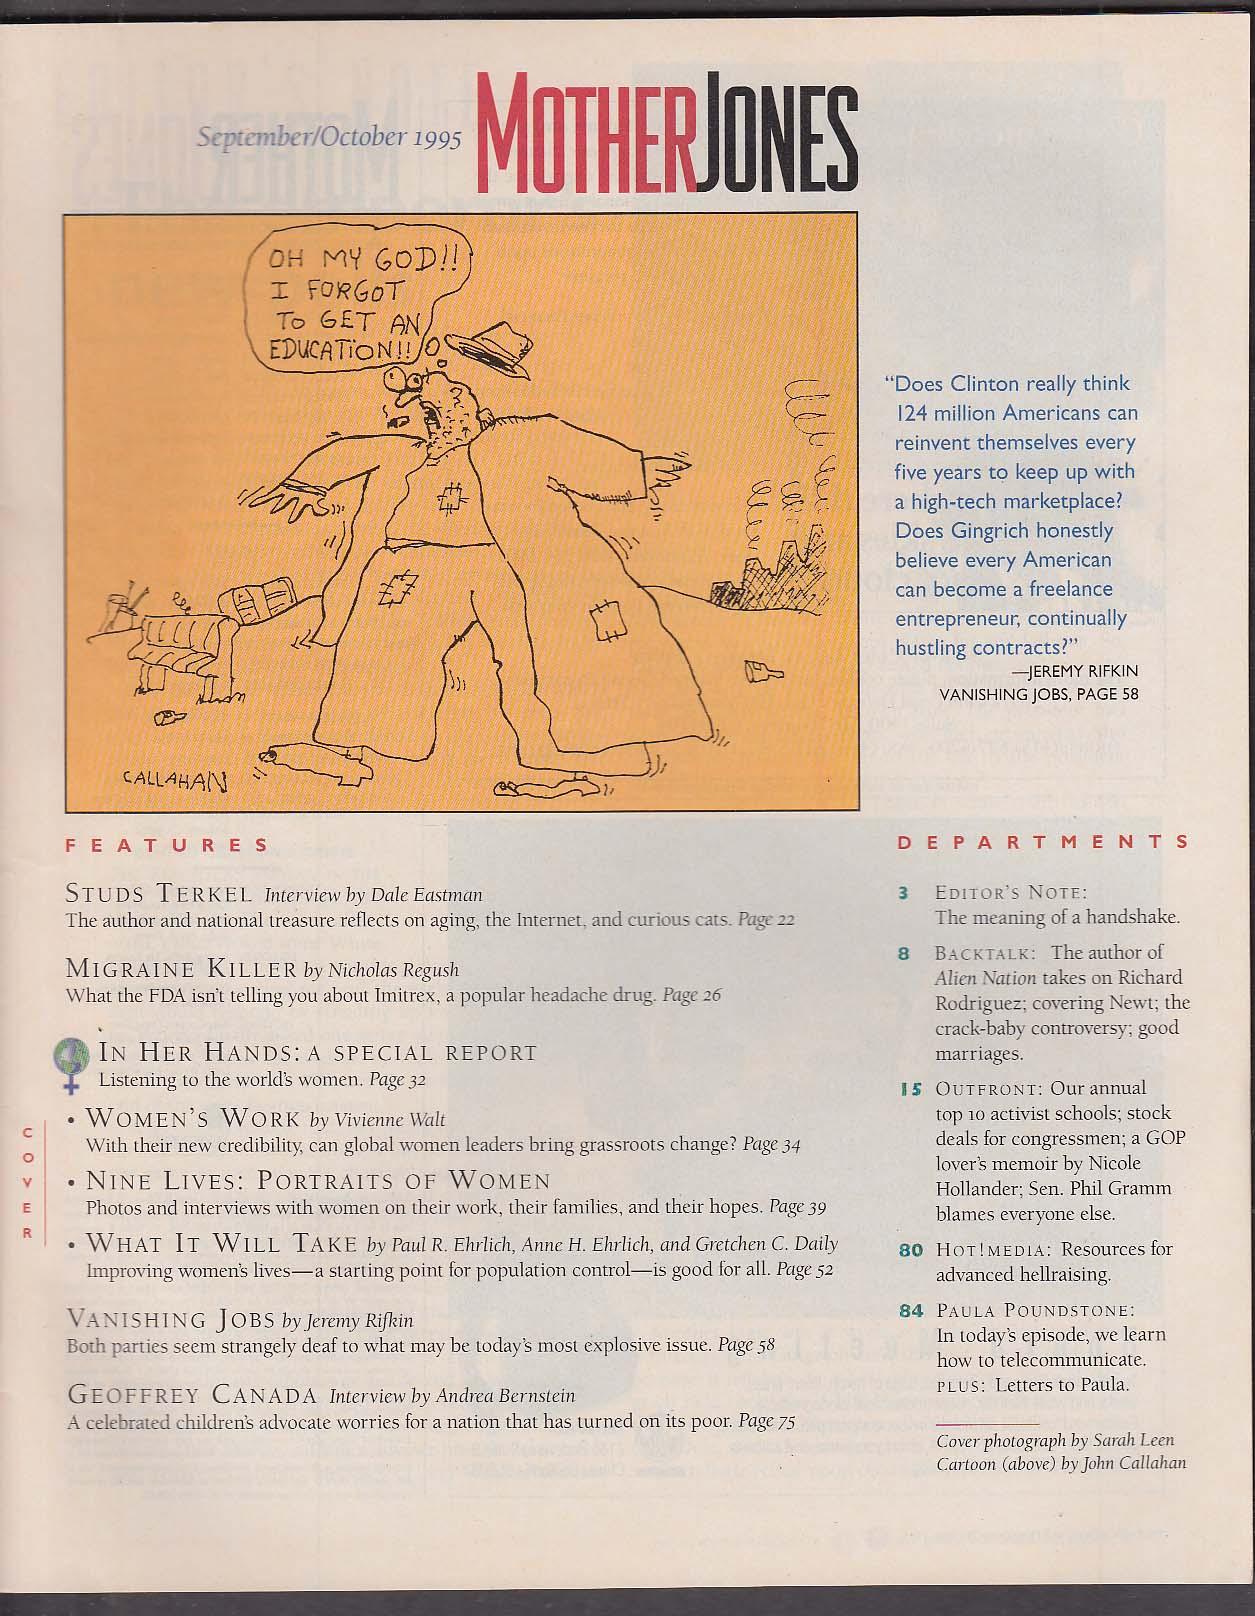 MOTHER JONES Studs Terkel Newt Gingrich Phil Gramm Paula Poundstone ++ 9-10 1995